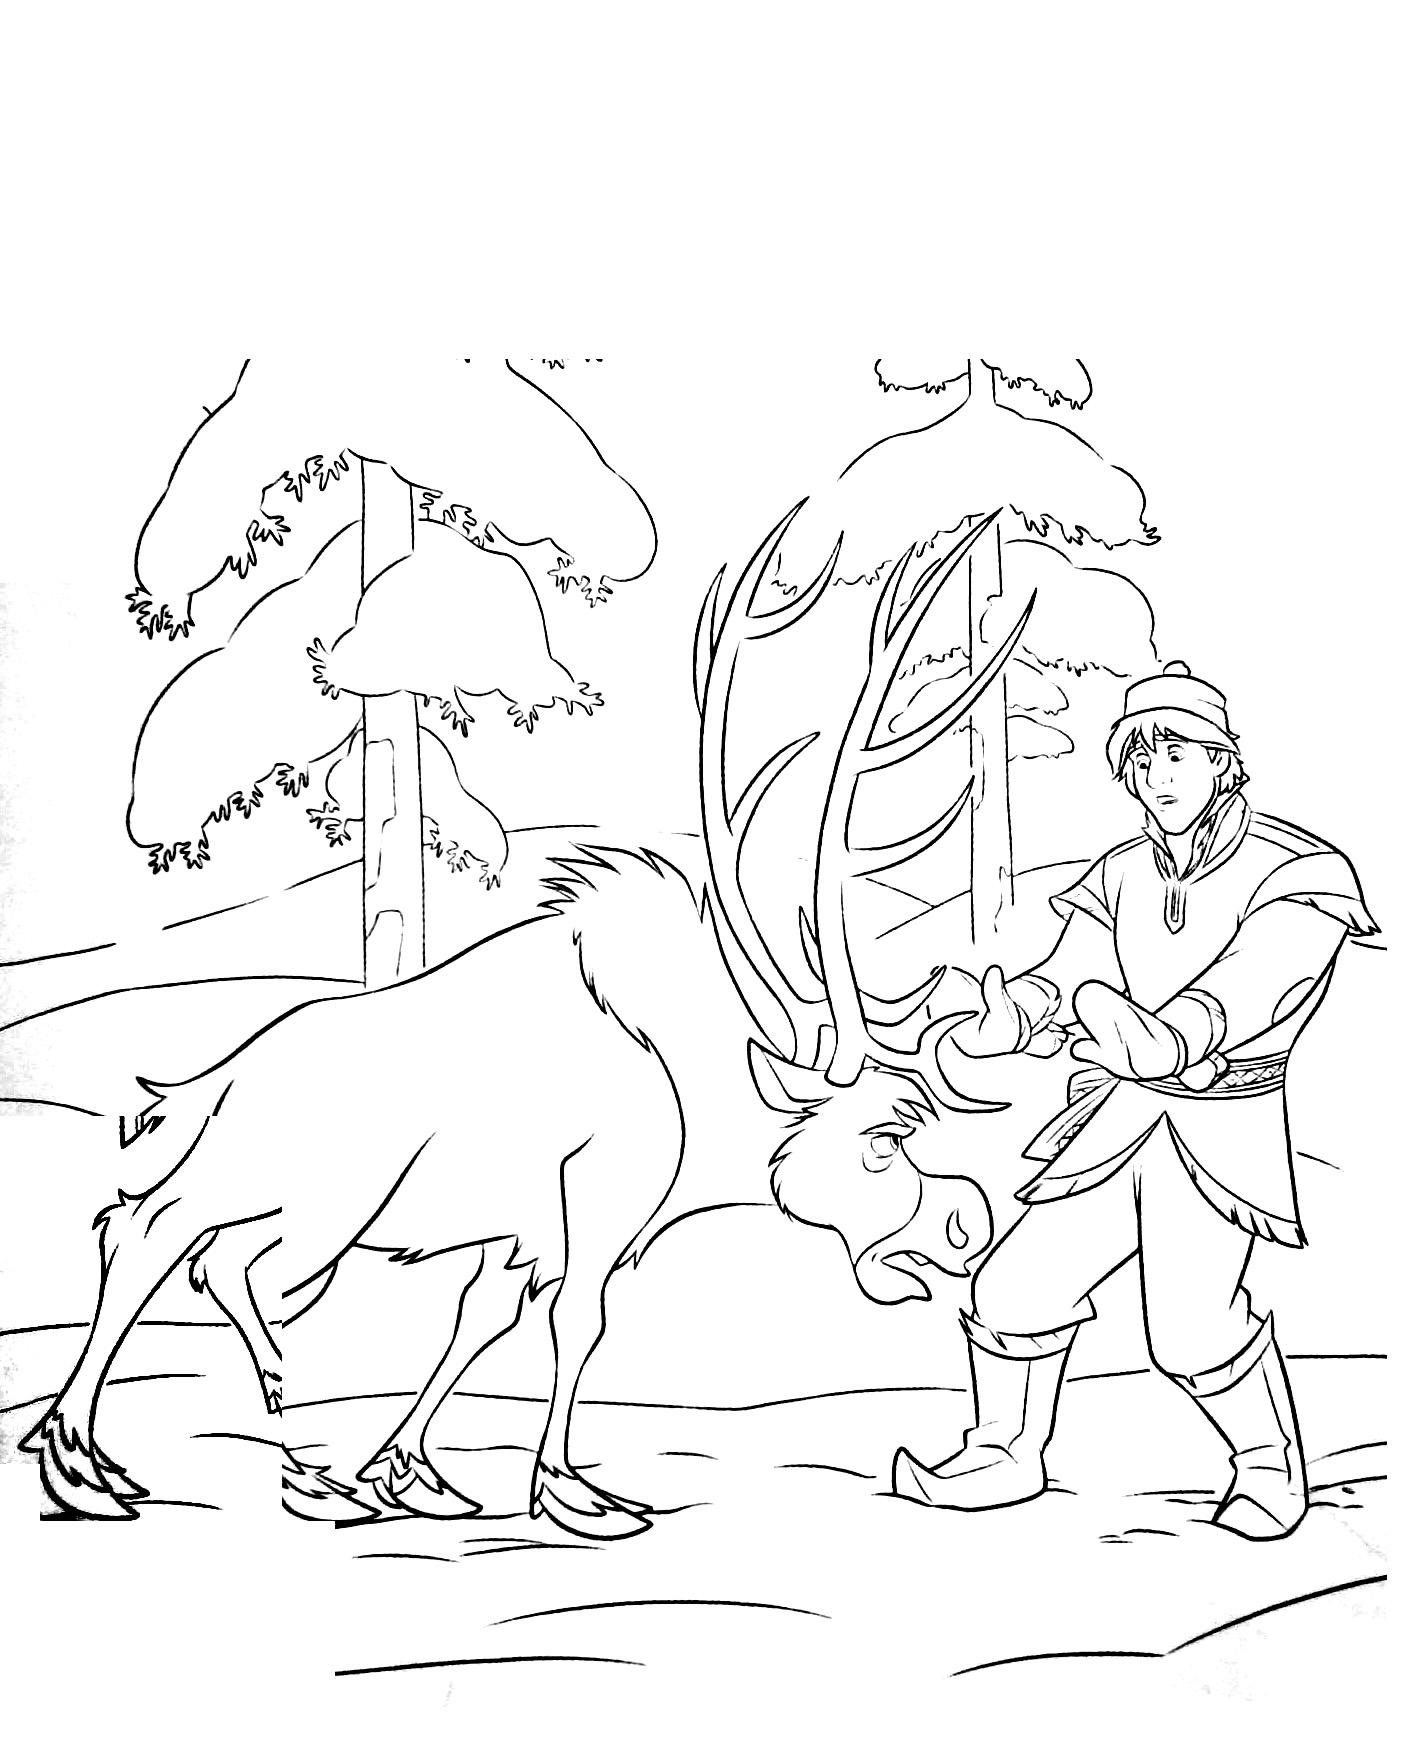 Simple Frozen coloring page : Sven & Kristoff